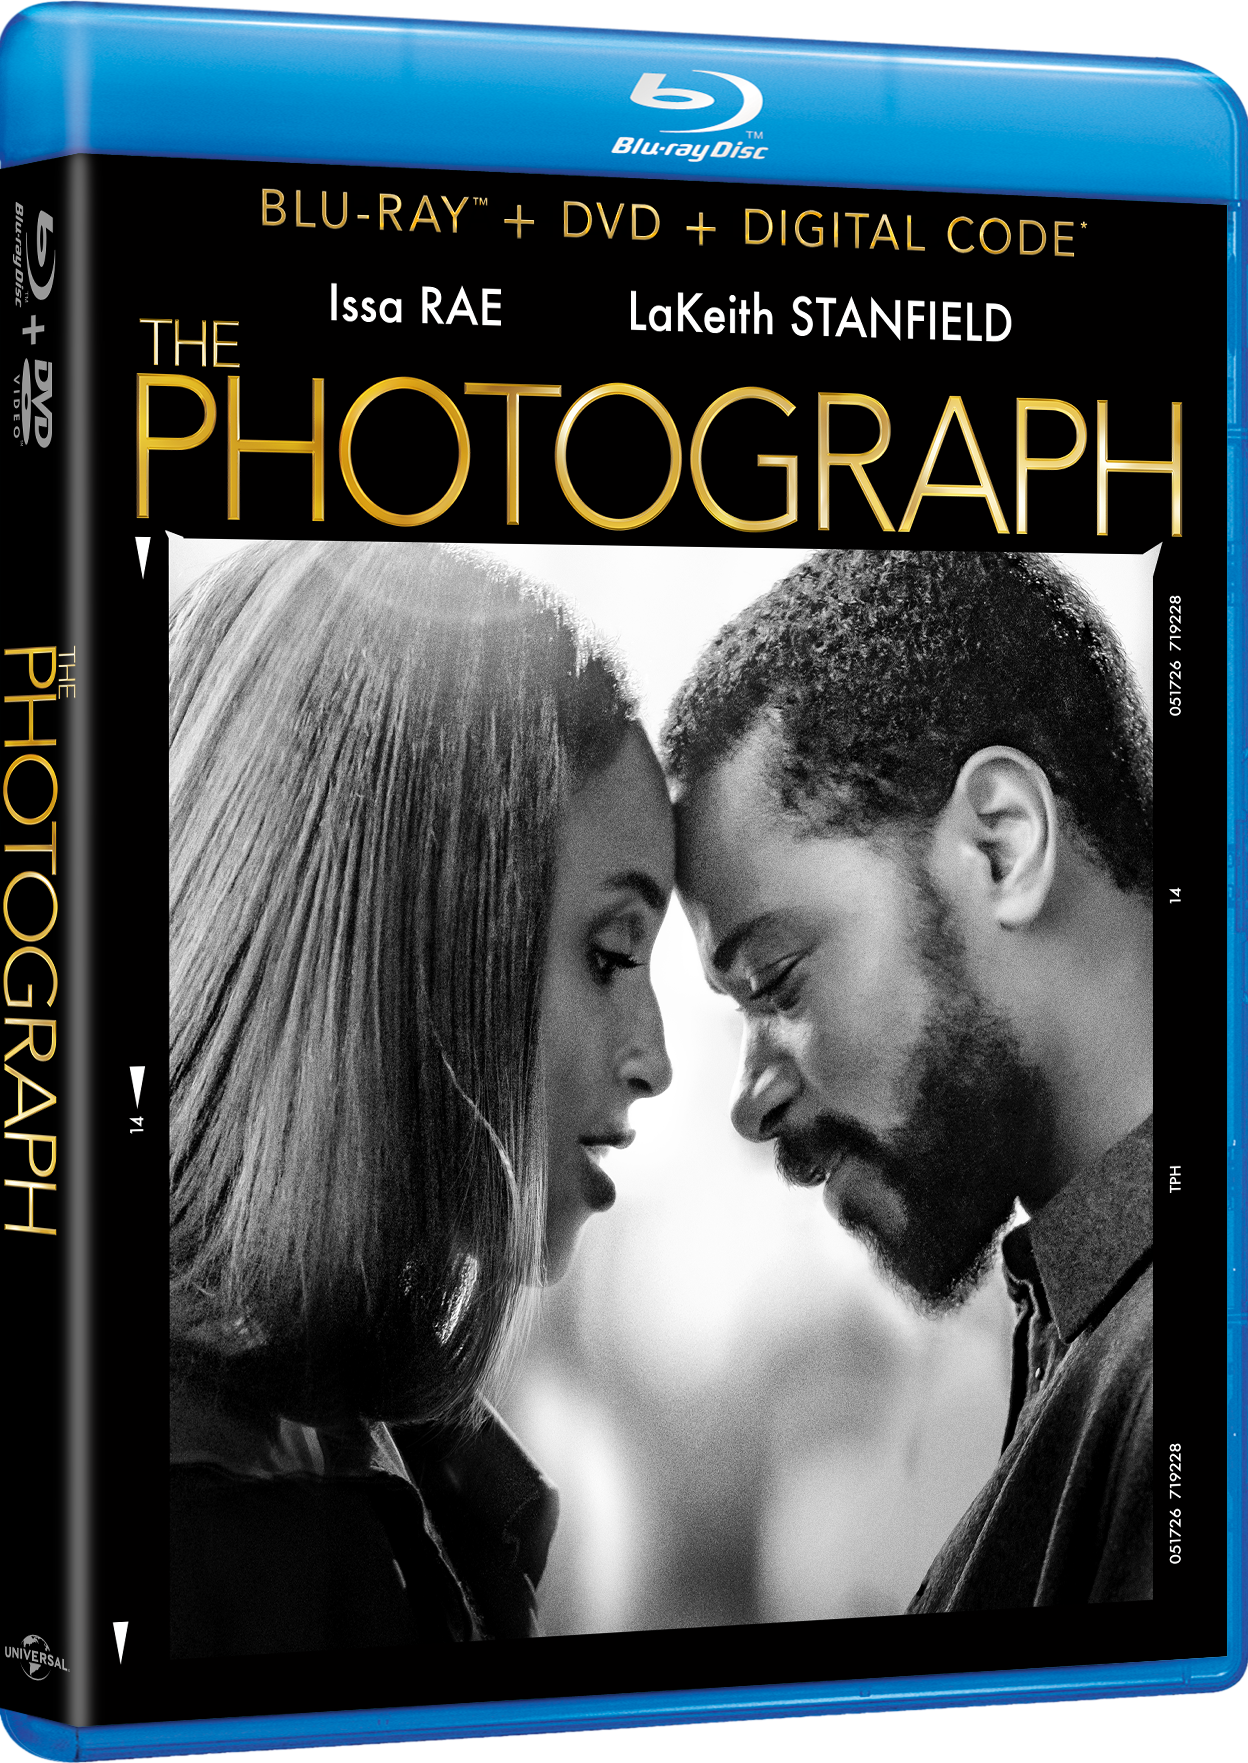 The Photograph Blu-ray